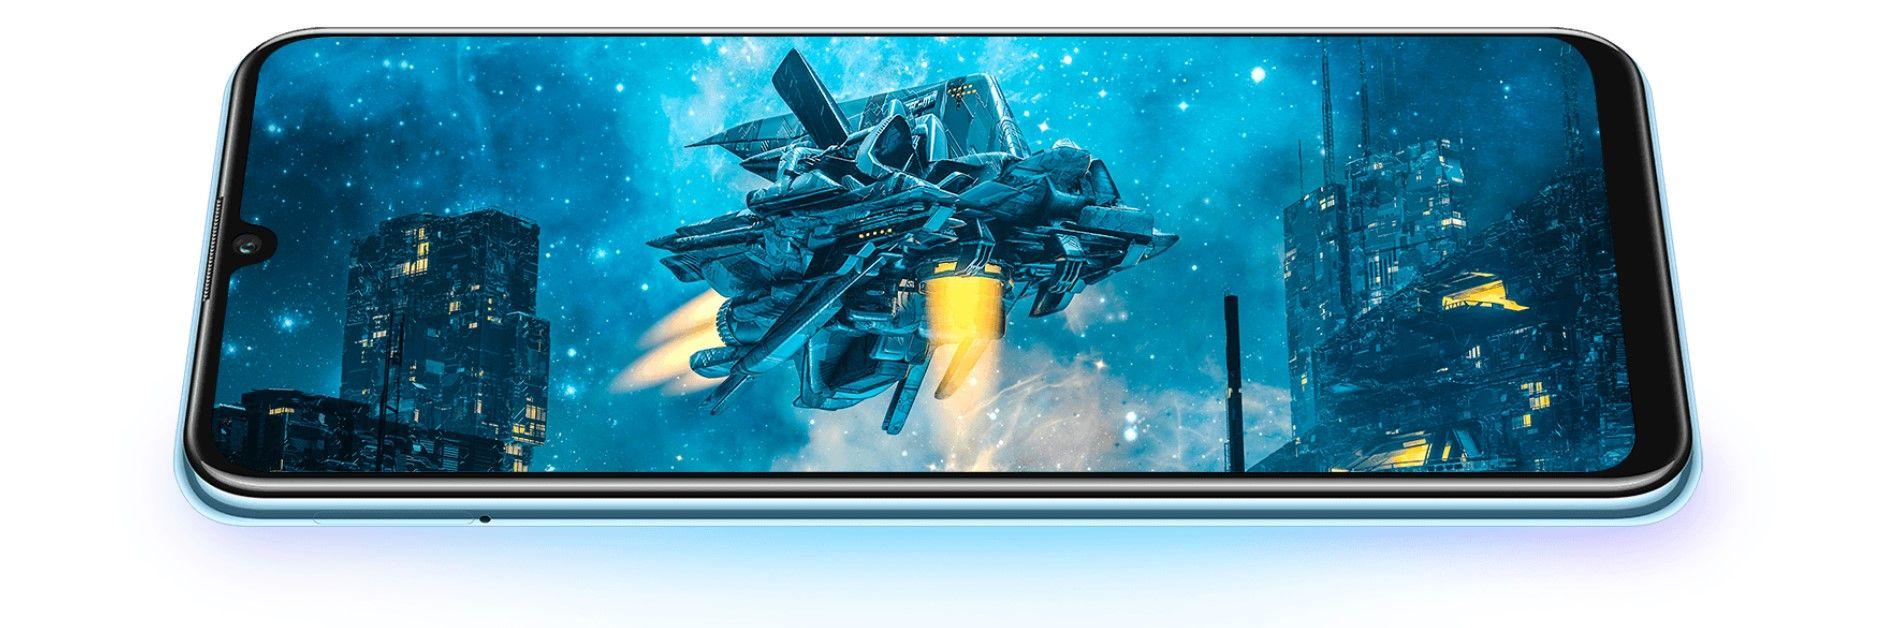 Huawei Y8p 6 процессор